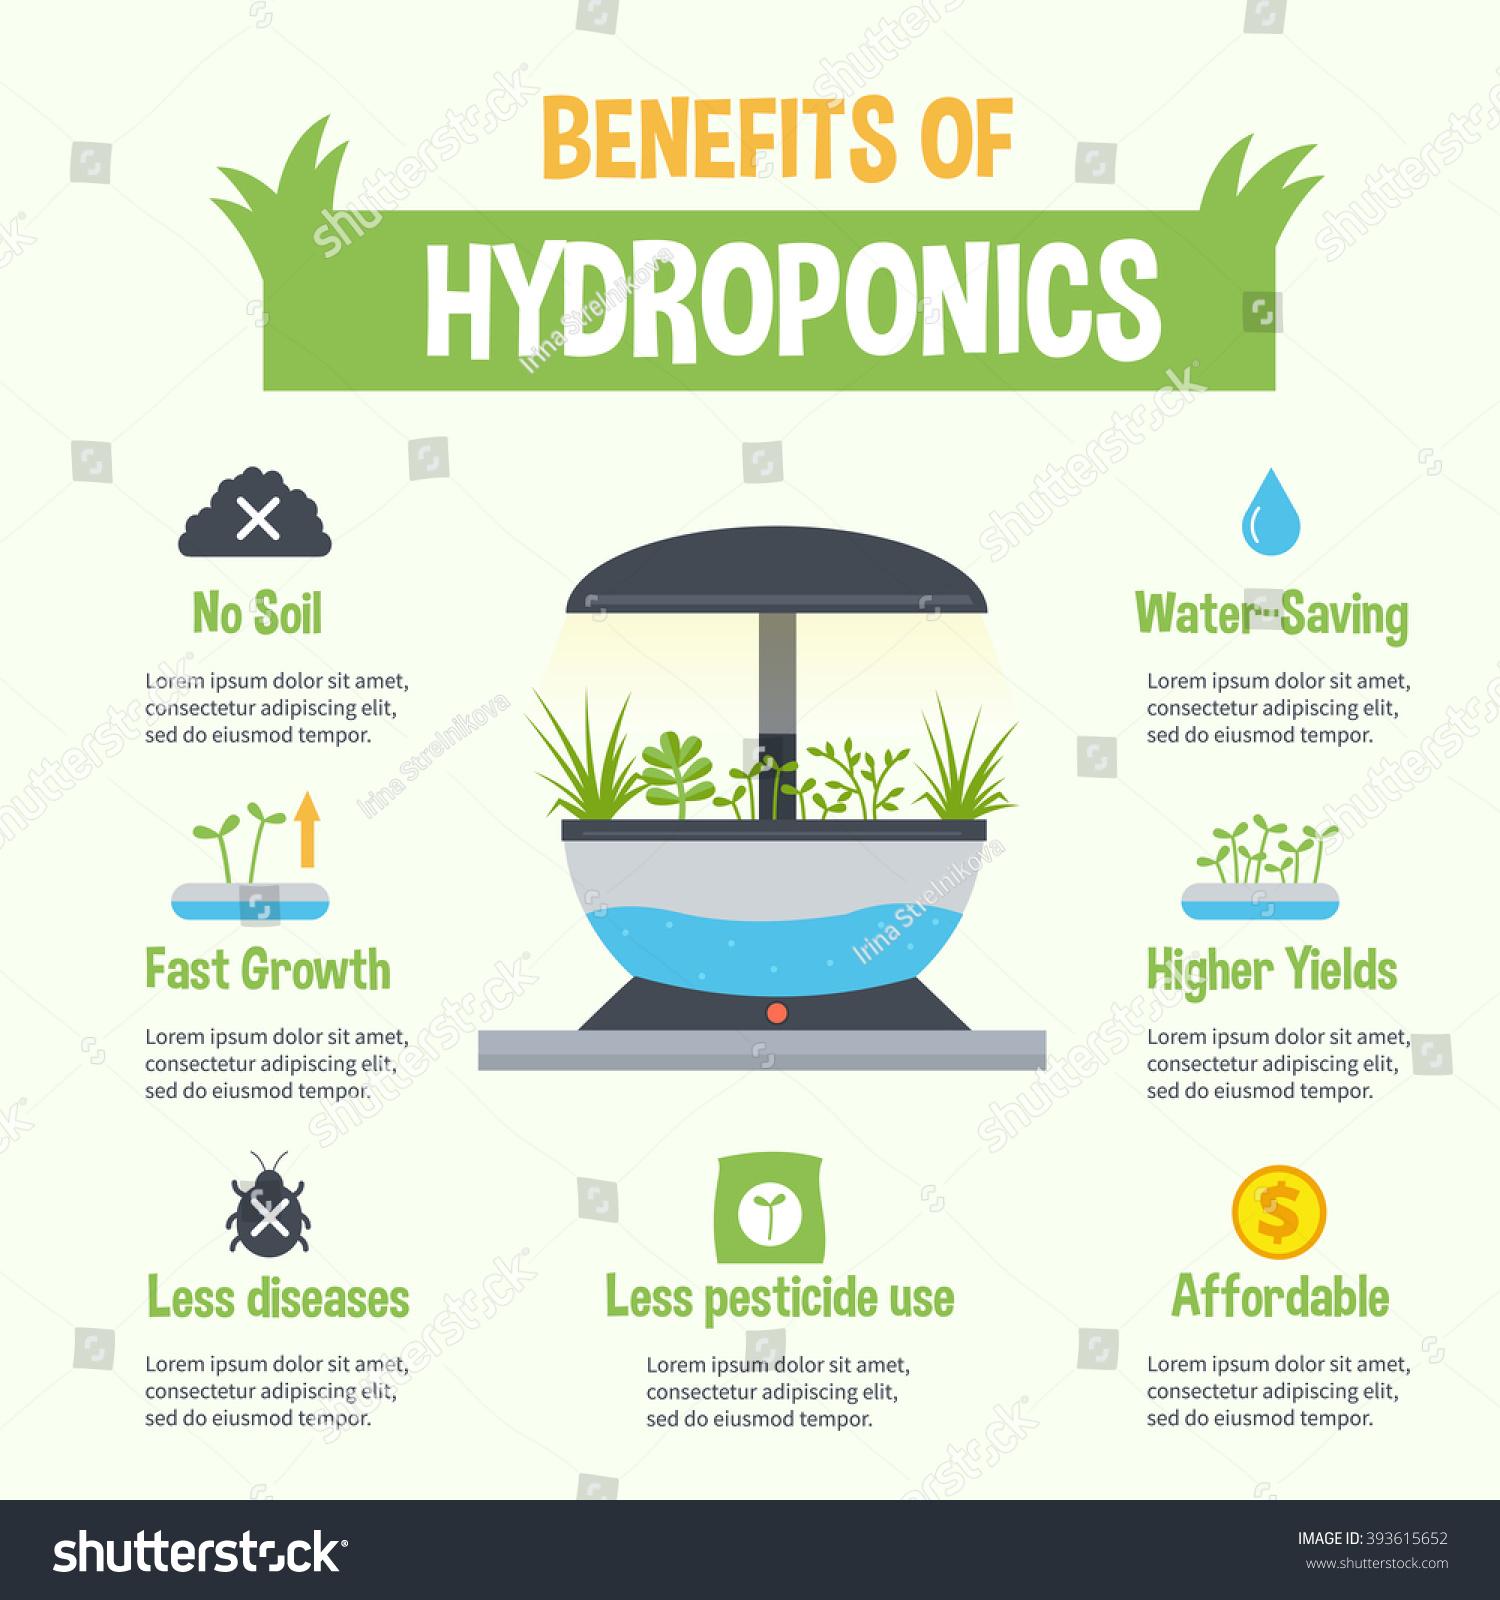 Hydroponics Benefits Infographic Vector Hydroponic